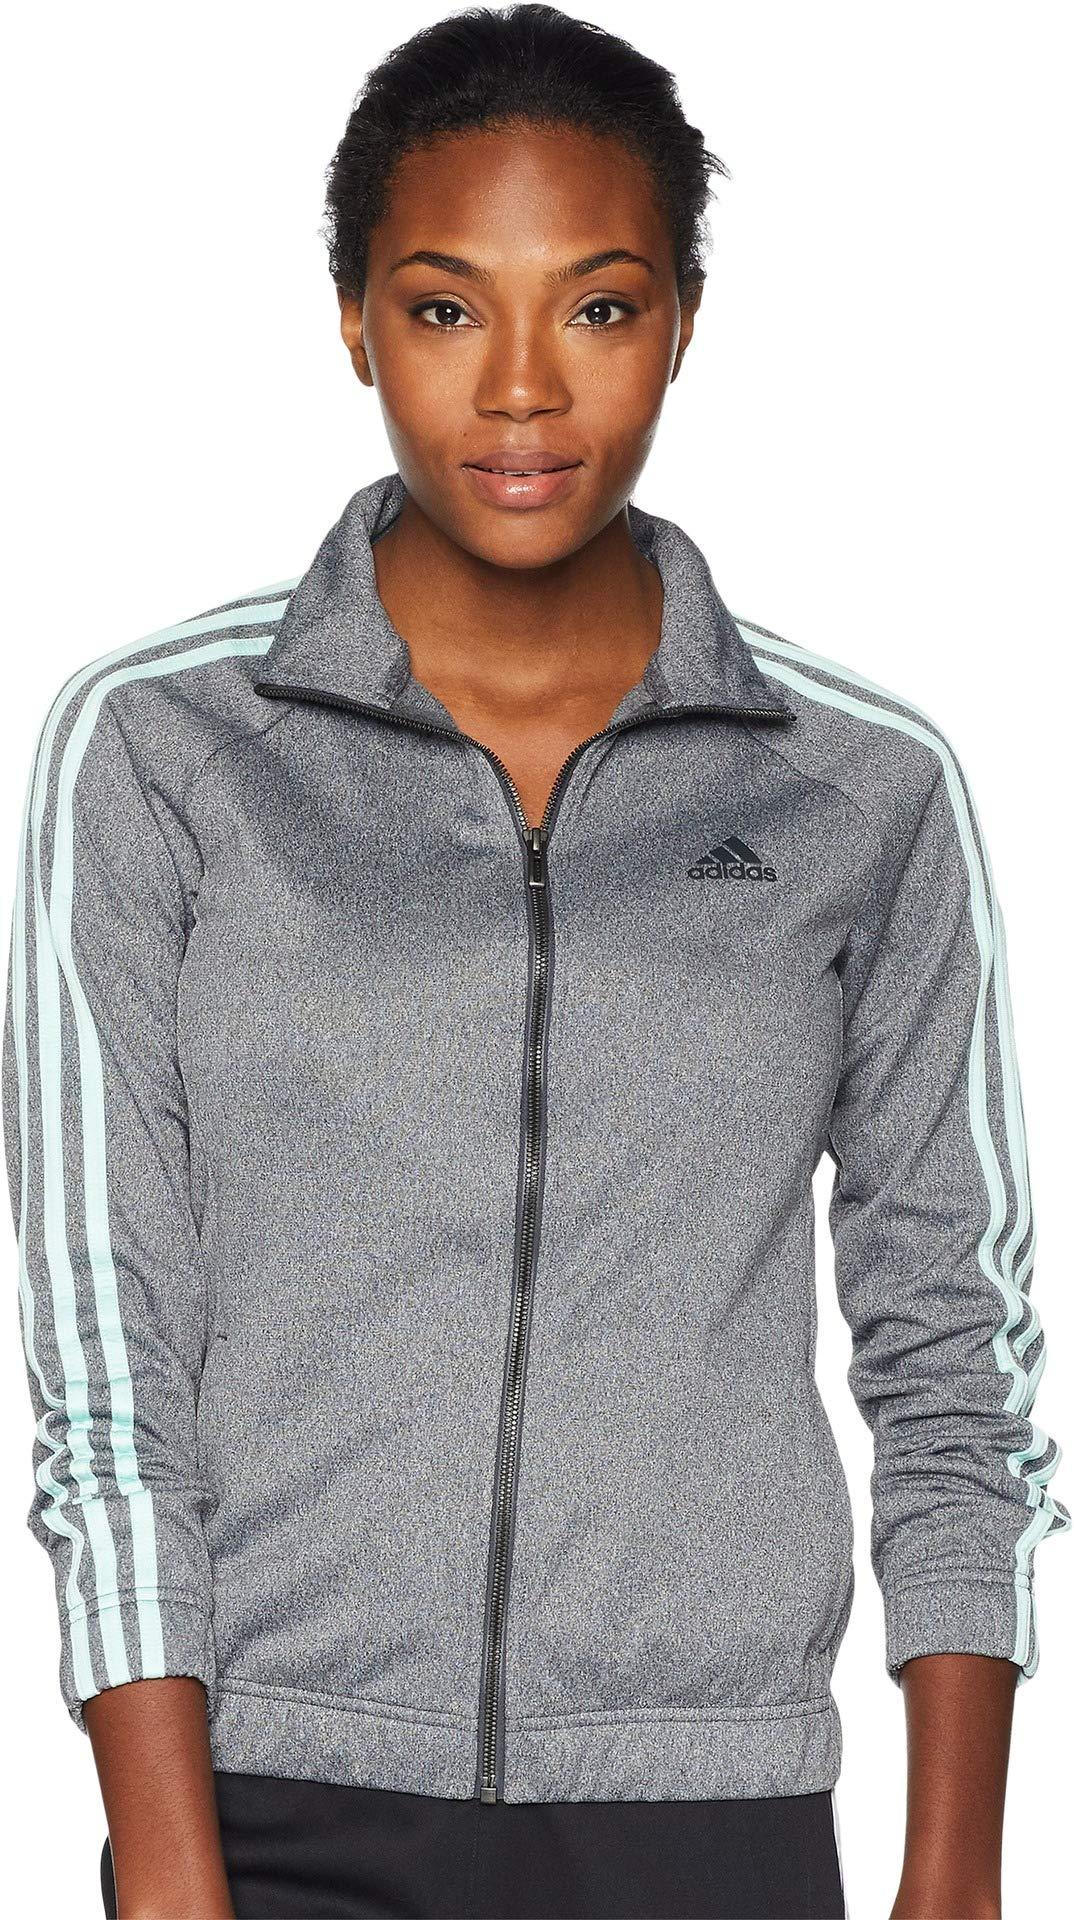 adidas Women's Designed-2-Move Track Jacket, Dark Grey/Clear Mint, Medium